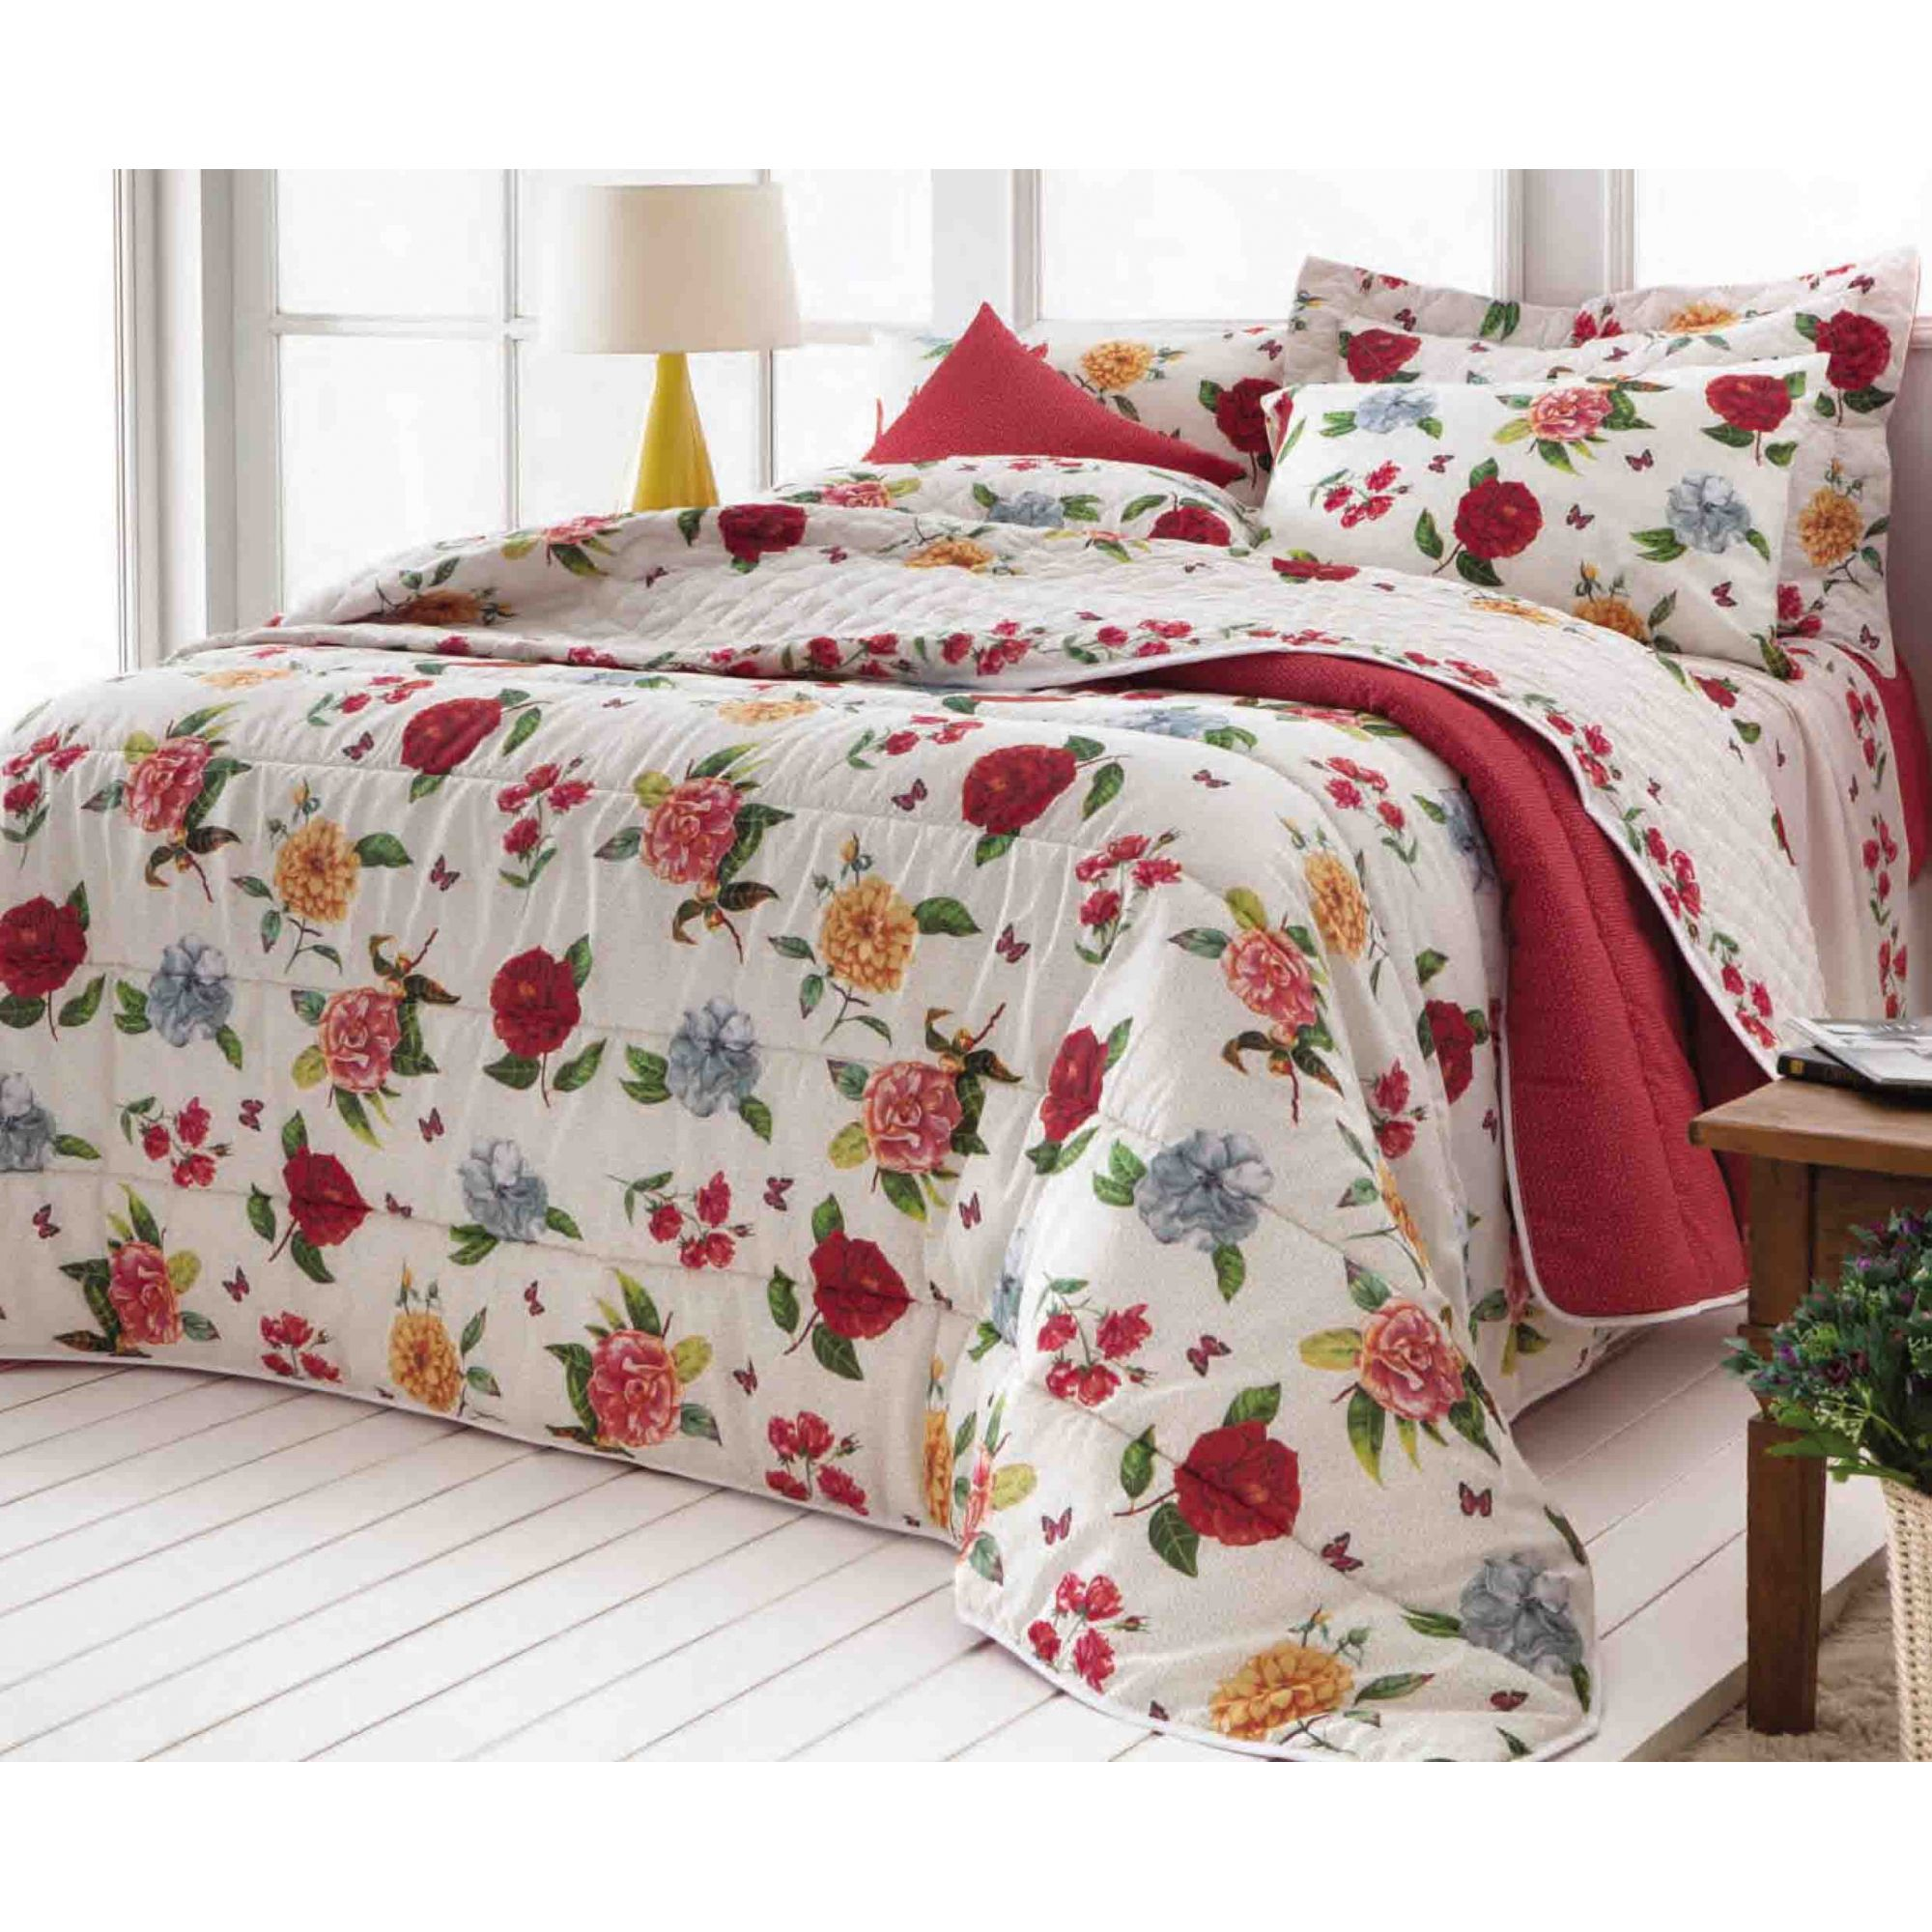 Jogo de cama casal duplo Talita 140 fios - Realce Premium